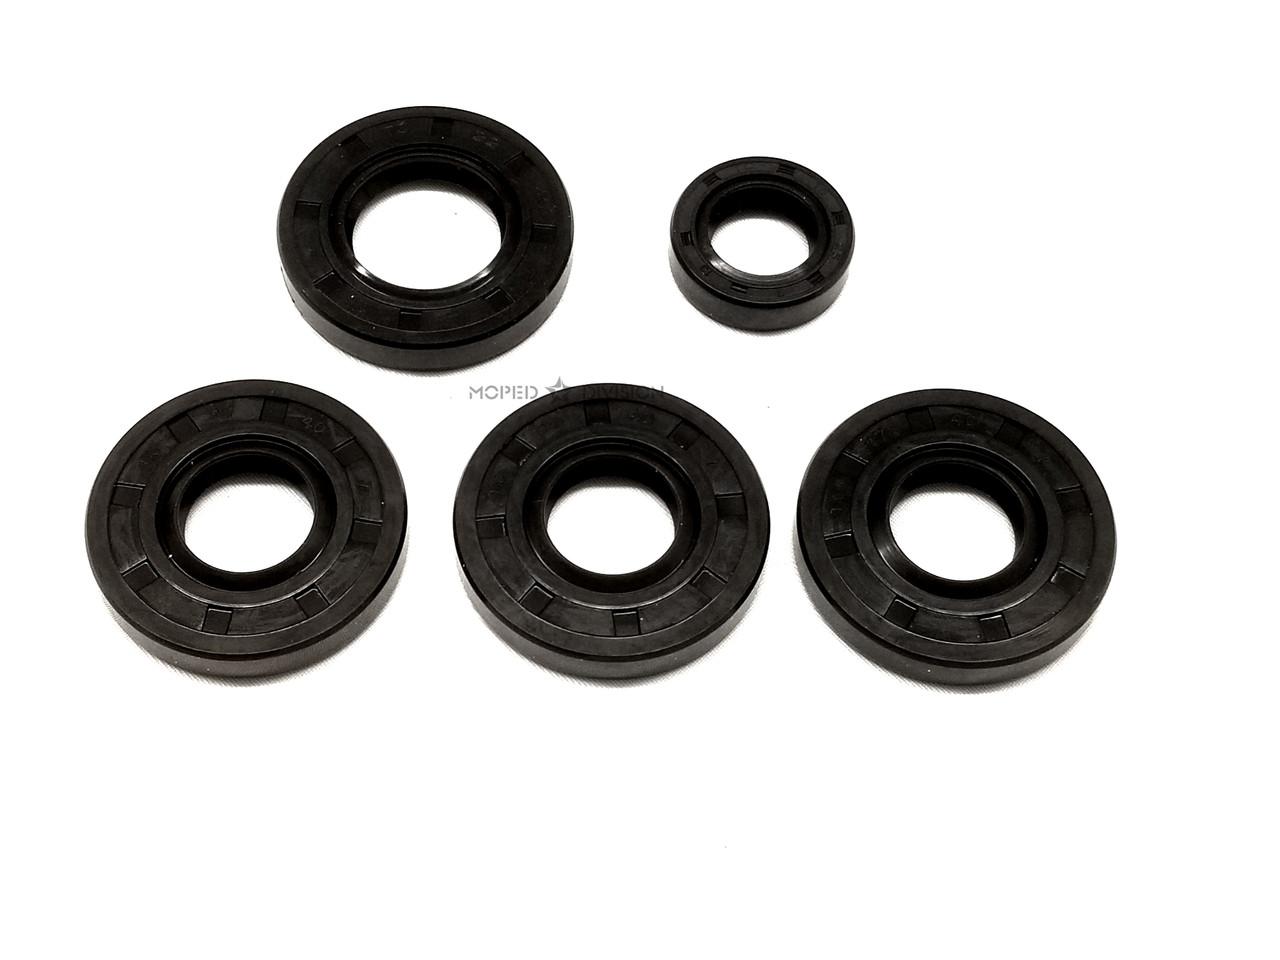 Puch Maxi E50 Oil Seal Set - Kickstart